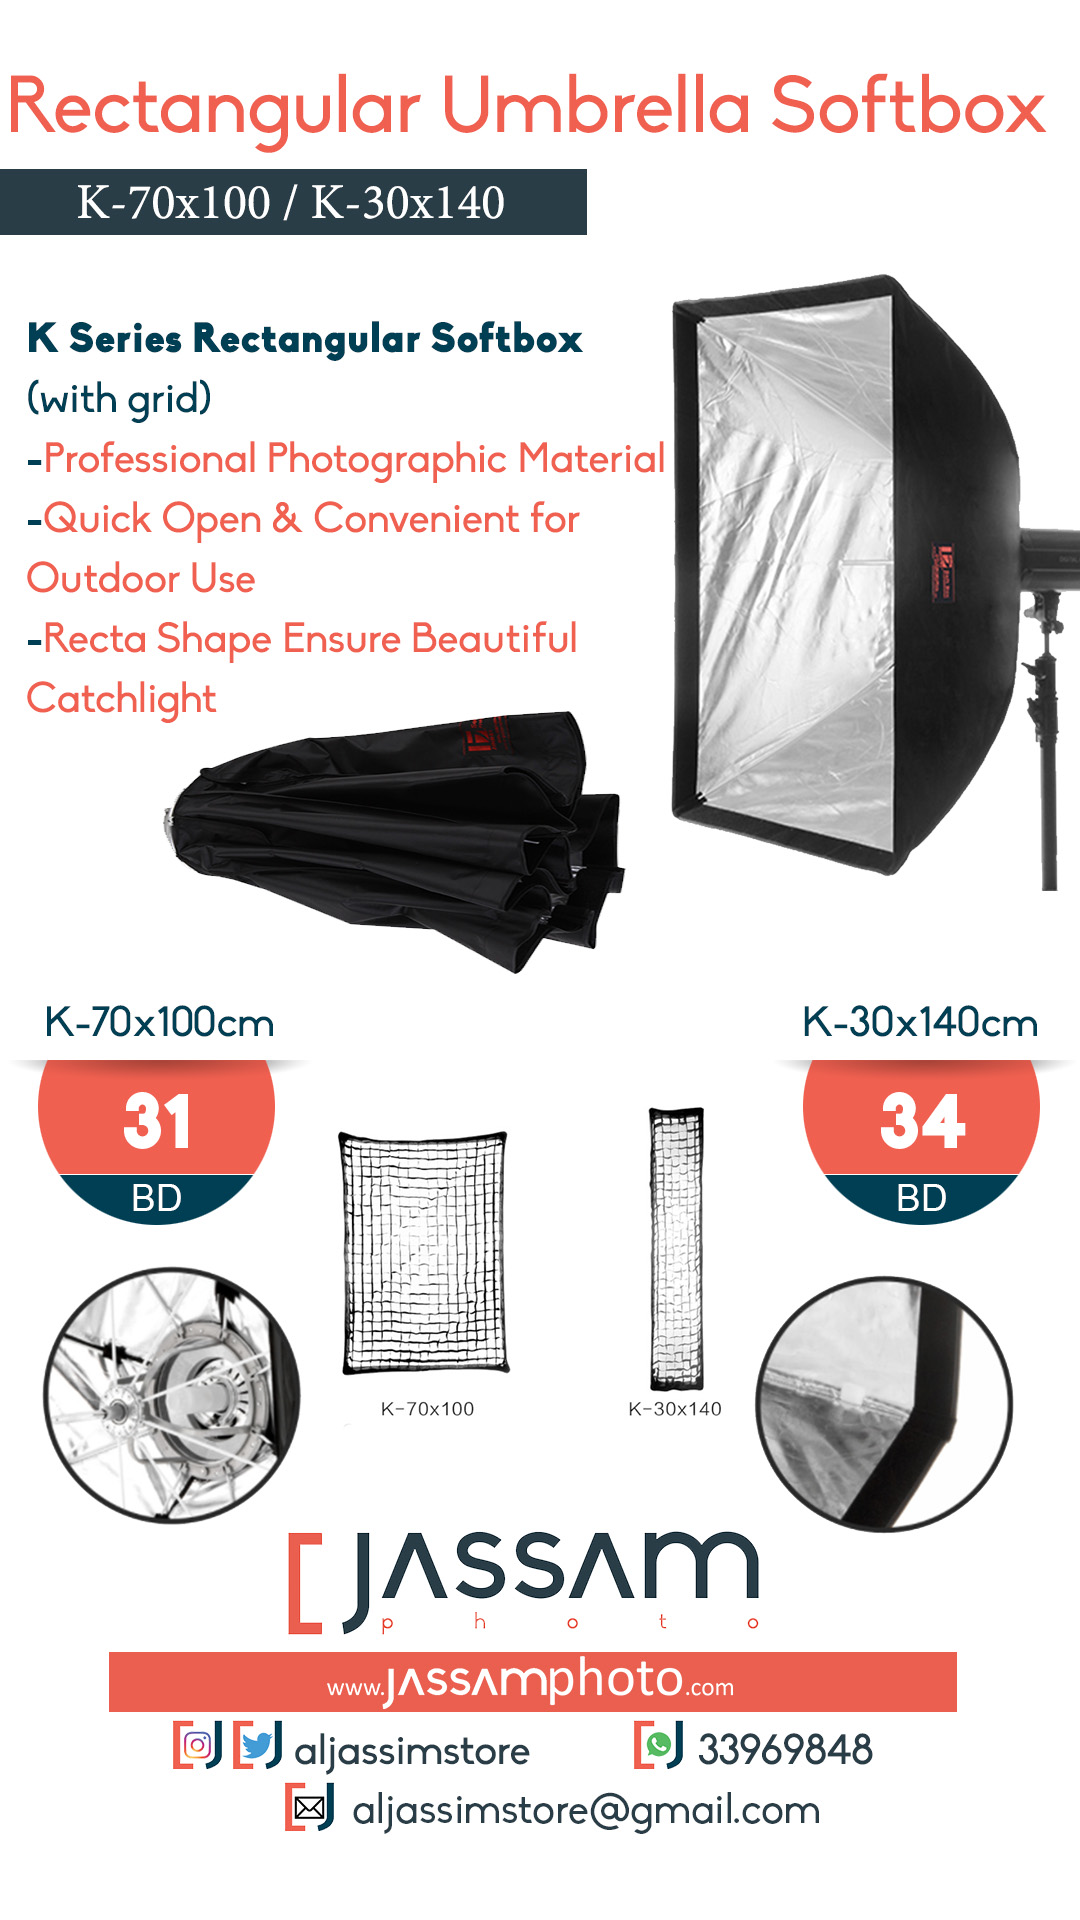 K-Rect Umbrella Softbox